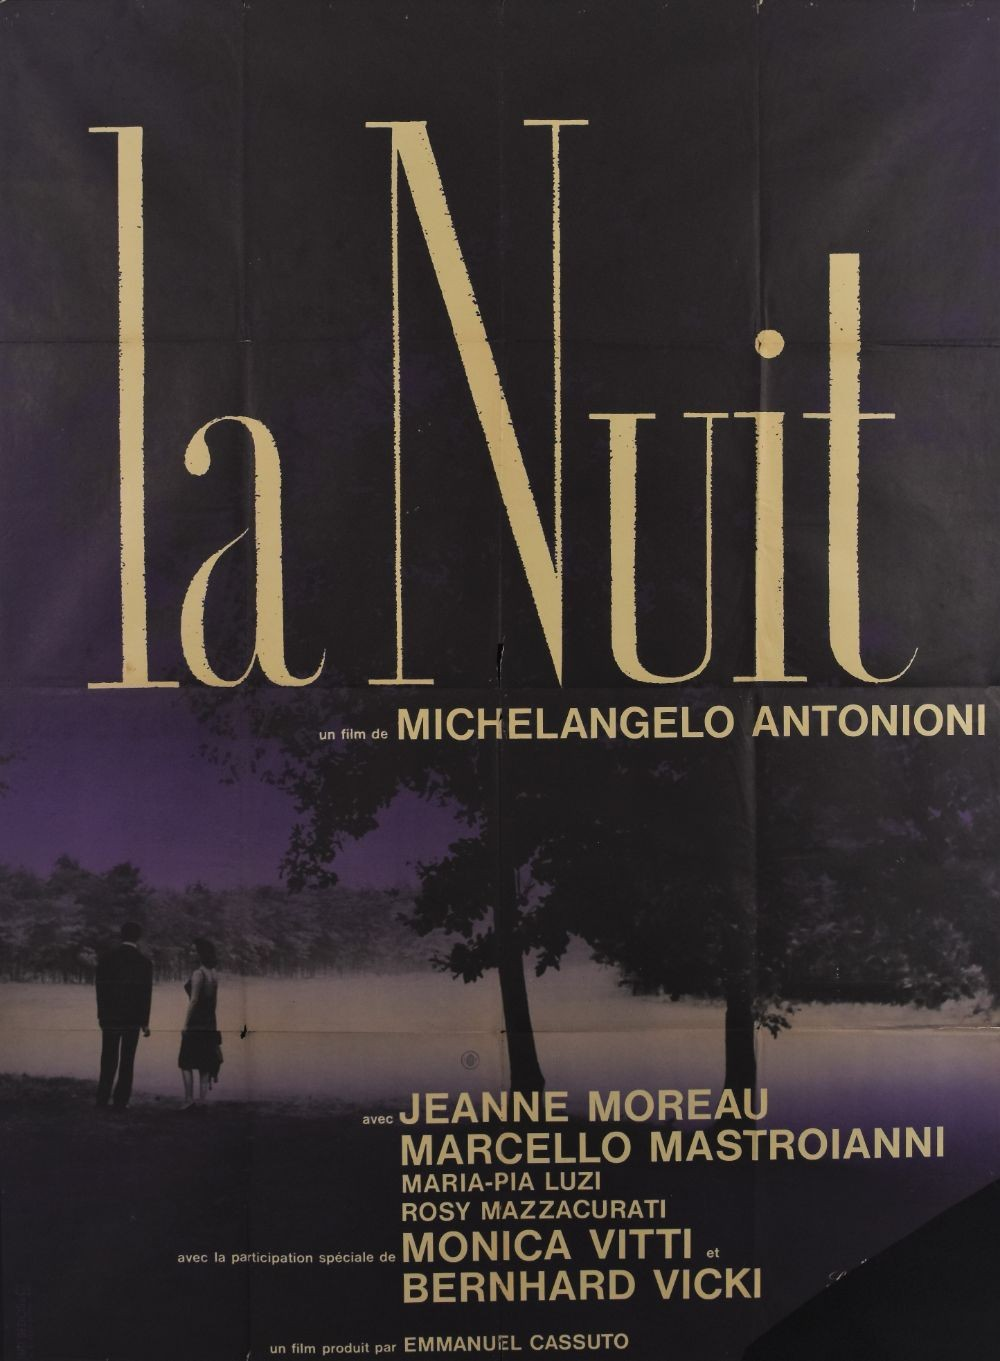 La notte original movie poster